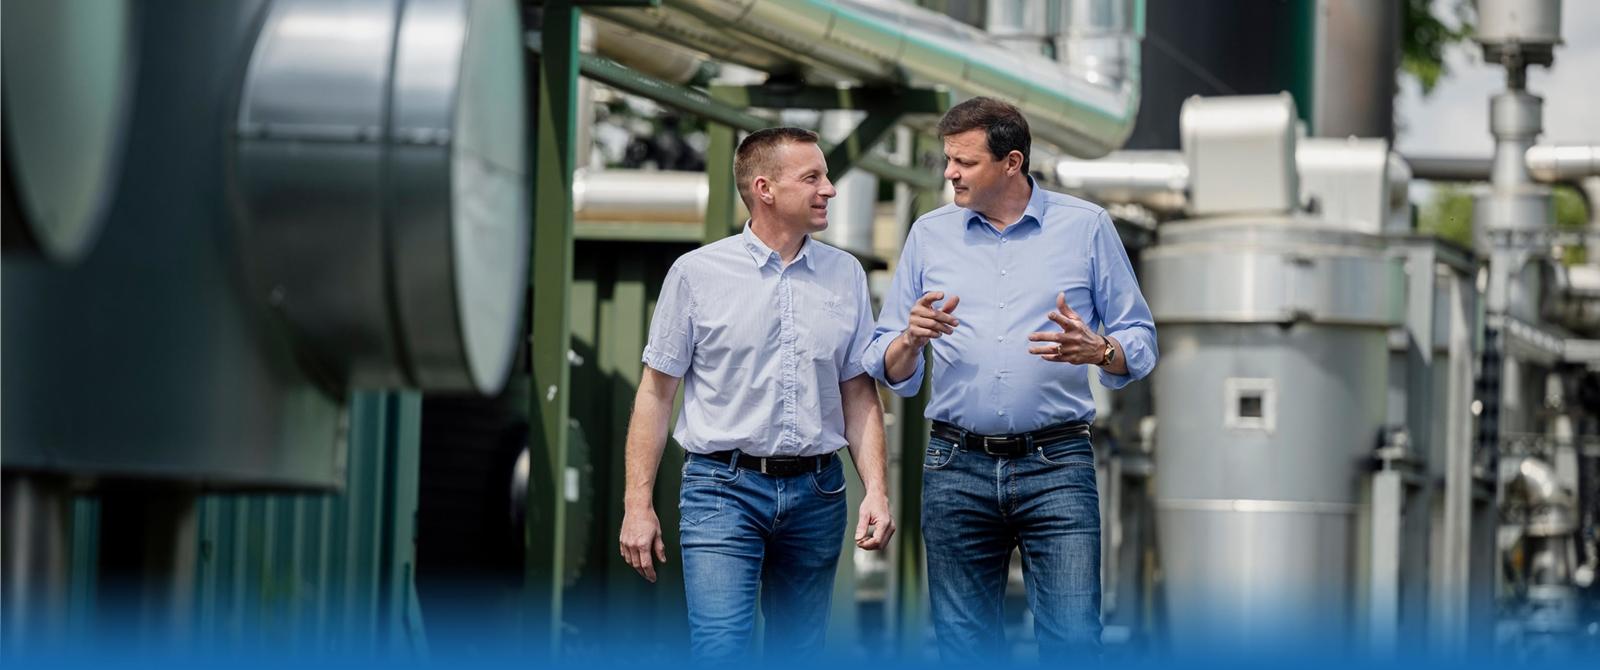 slider-oliver-grundmann-2021-bundestagswahlen-stade-rotenburg-bremervoerde (15)